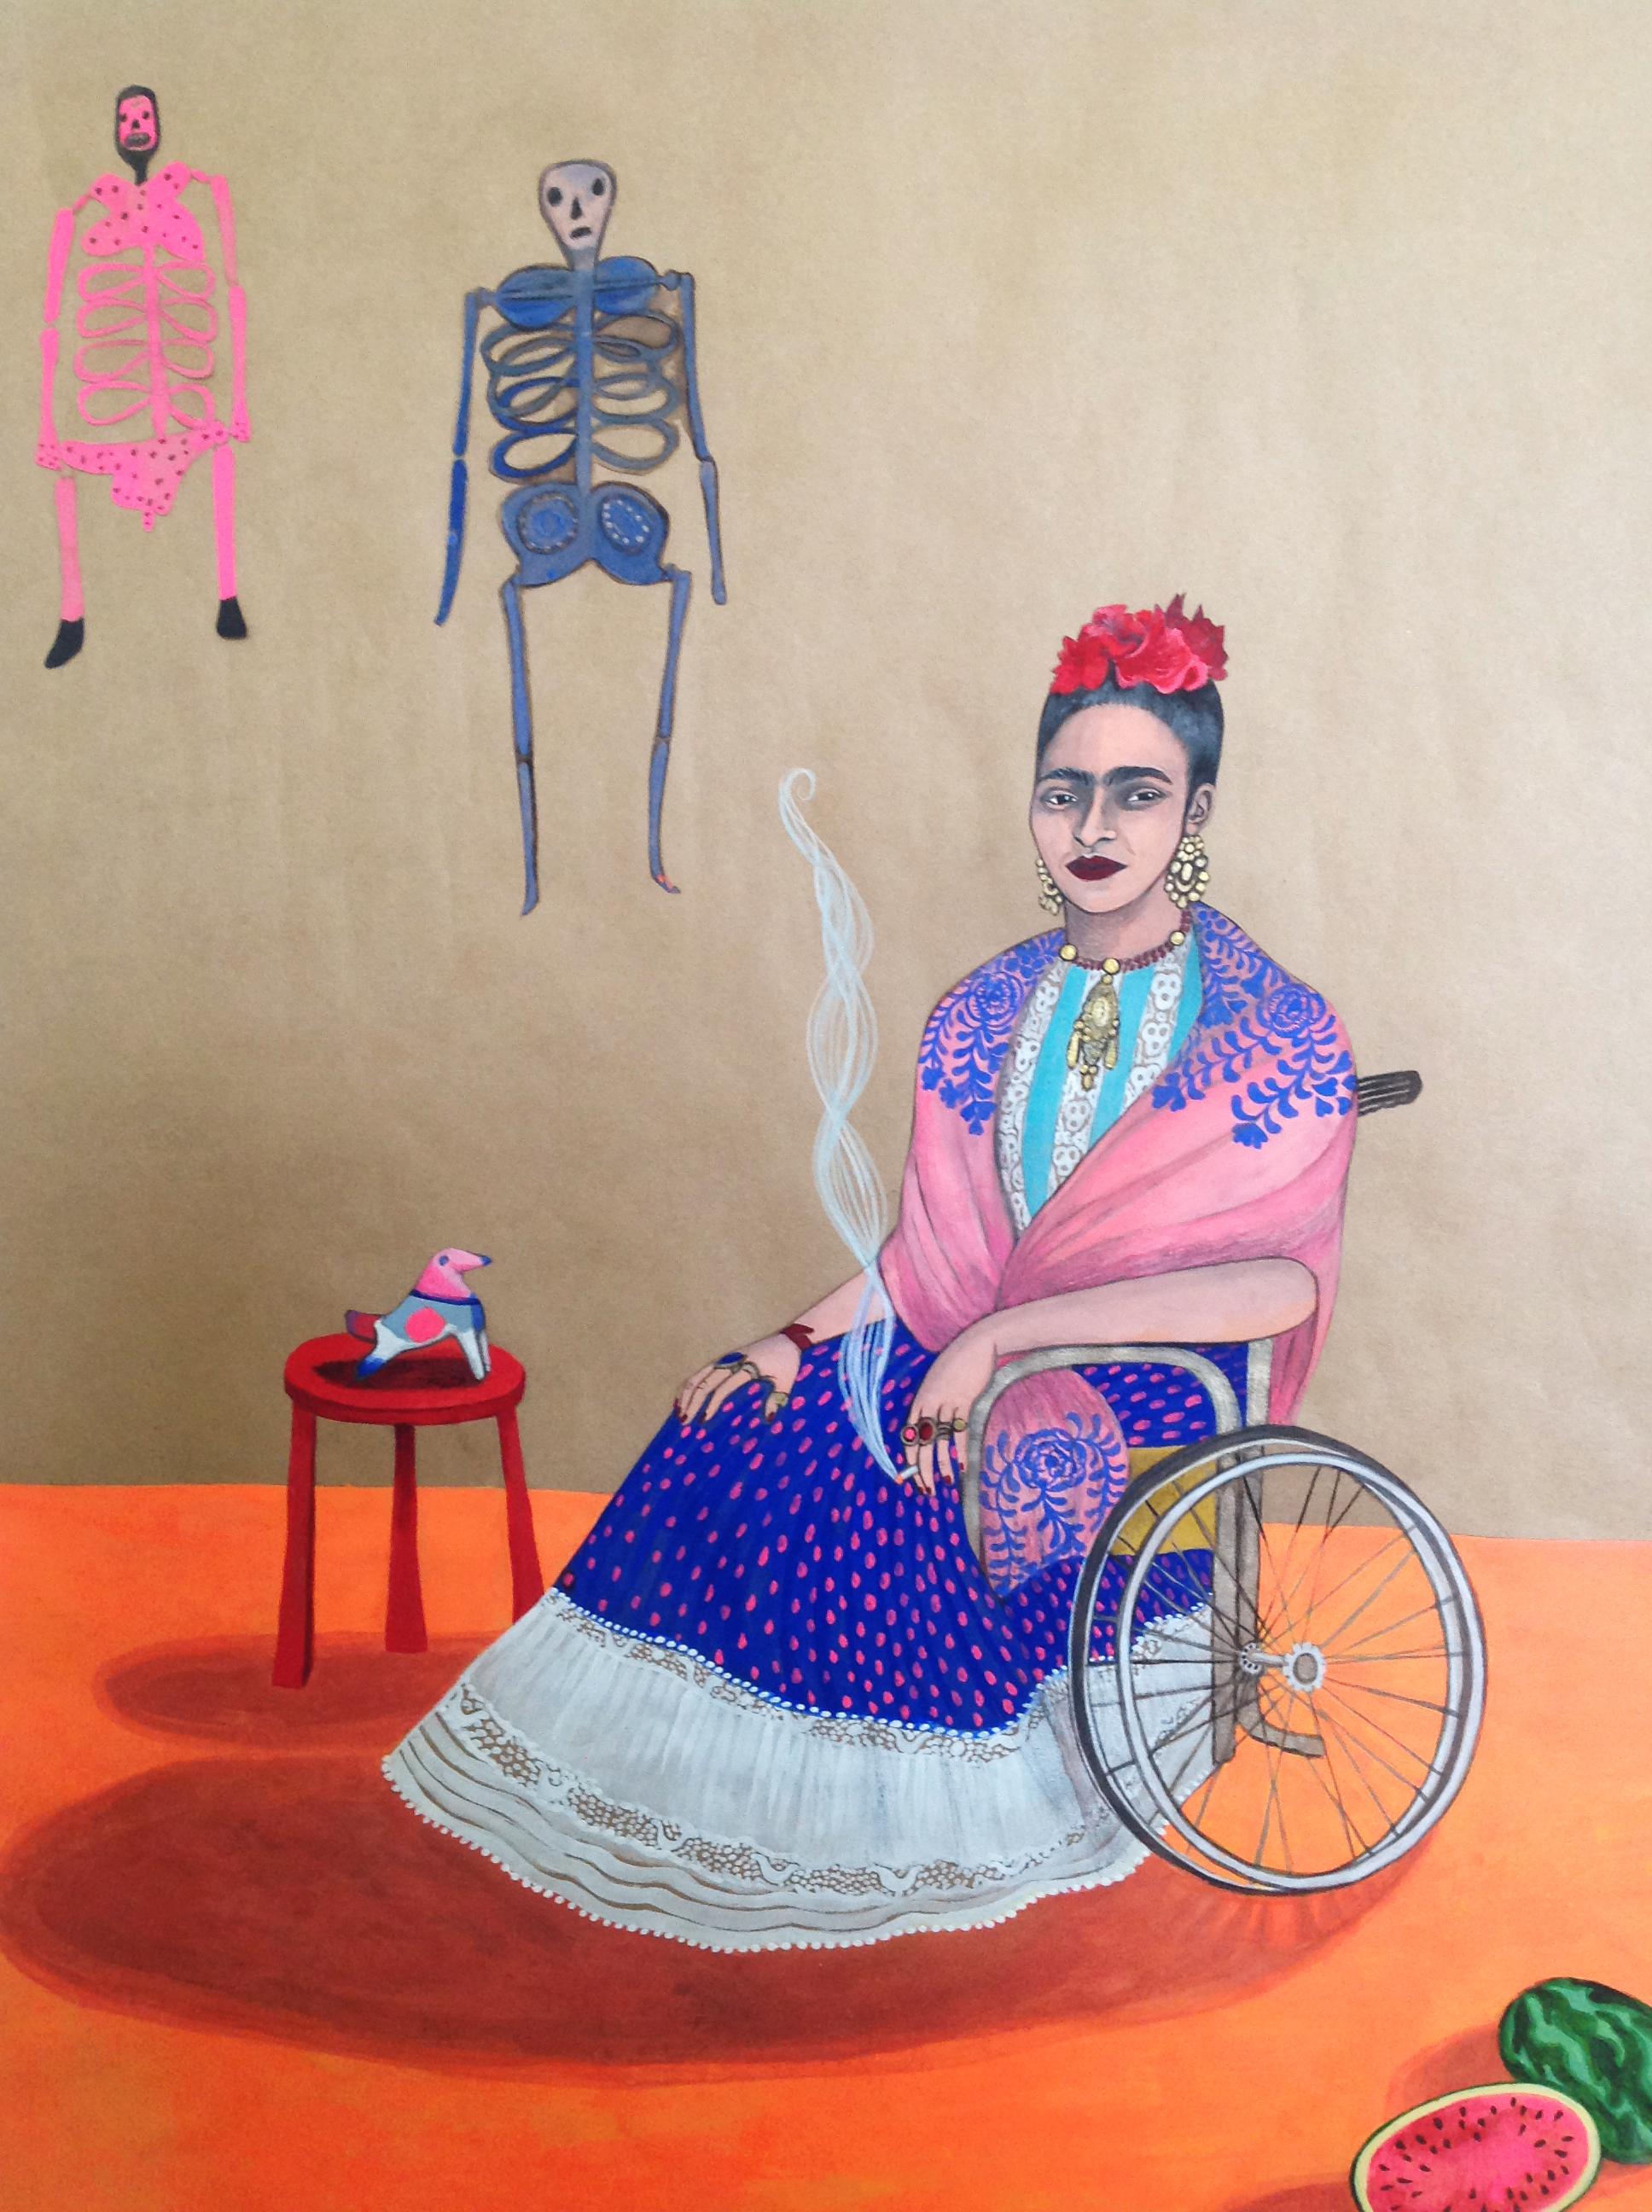 Frida Kahlo in wheelchair, 2015